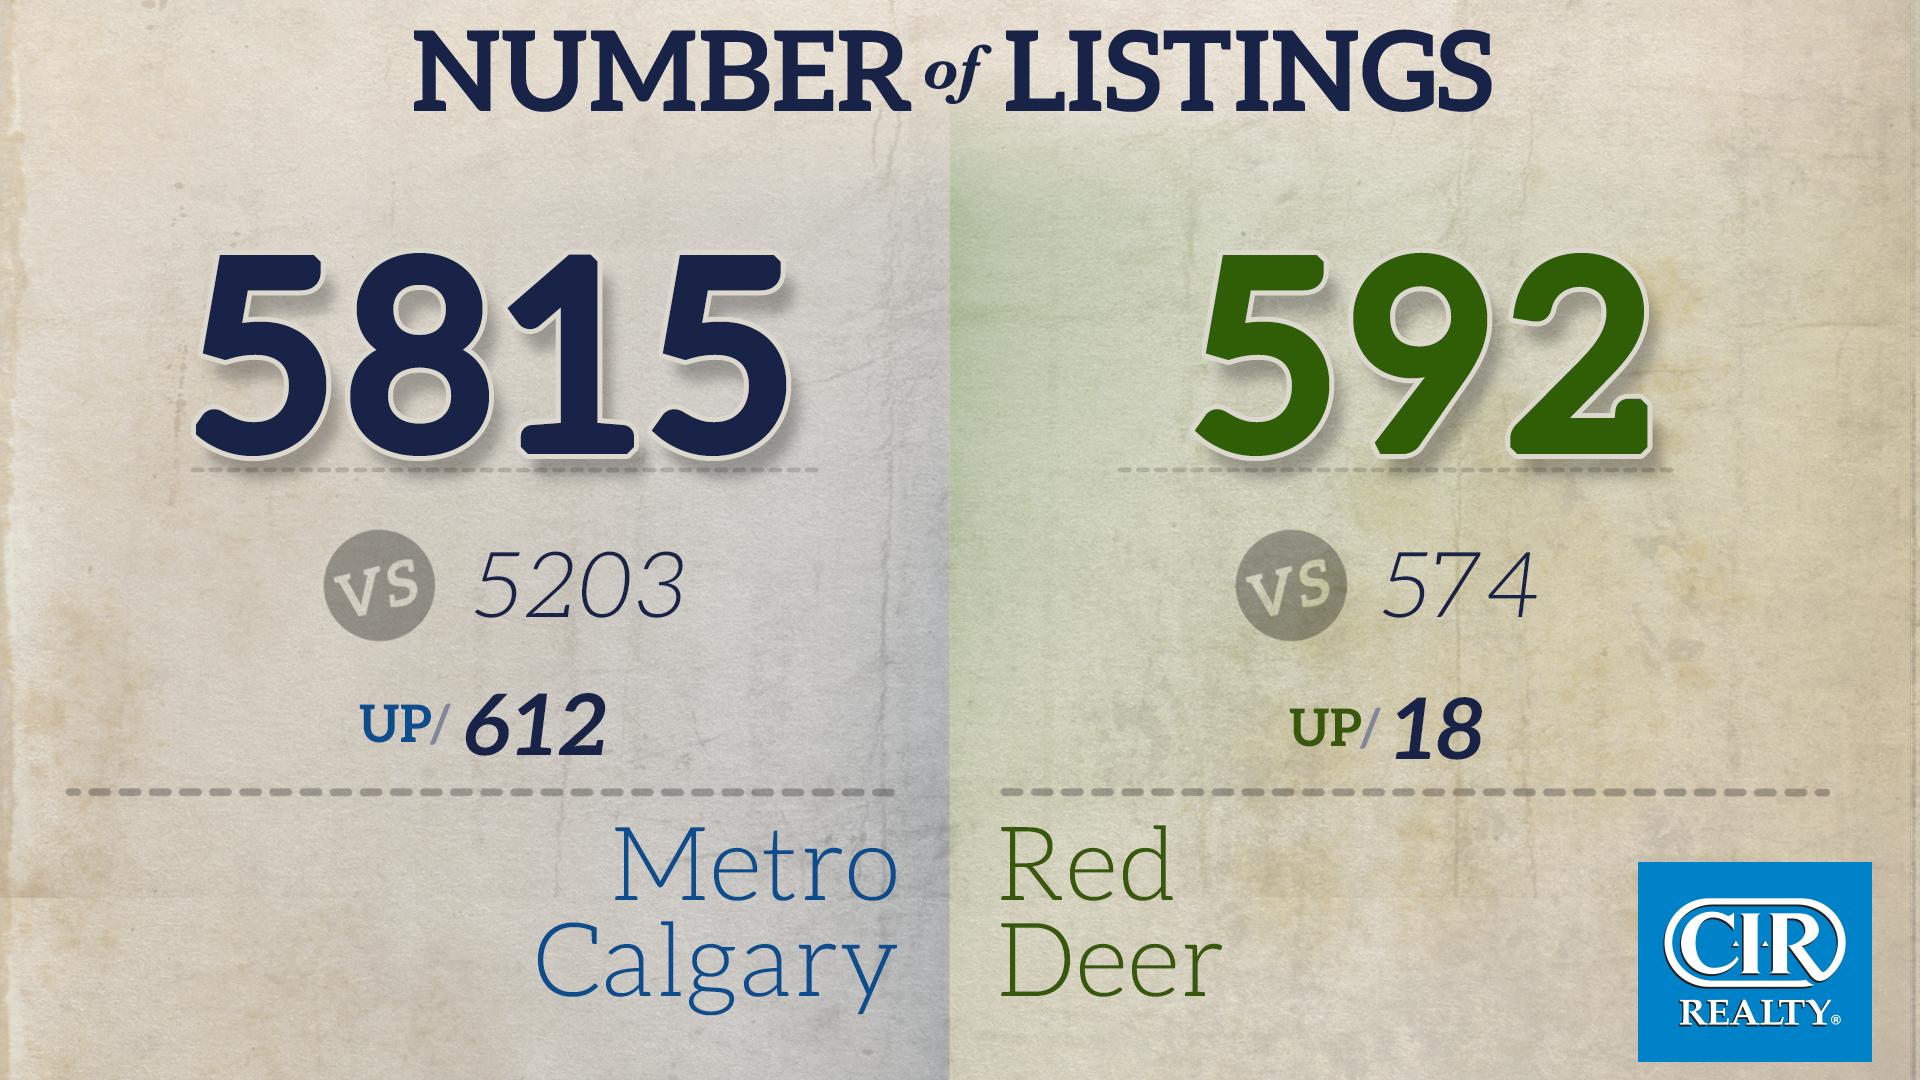 Number of listings